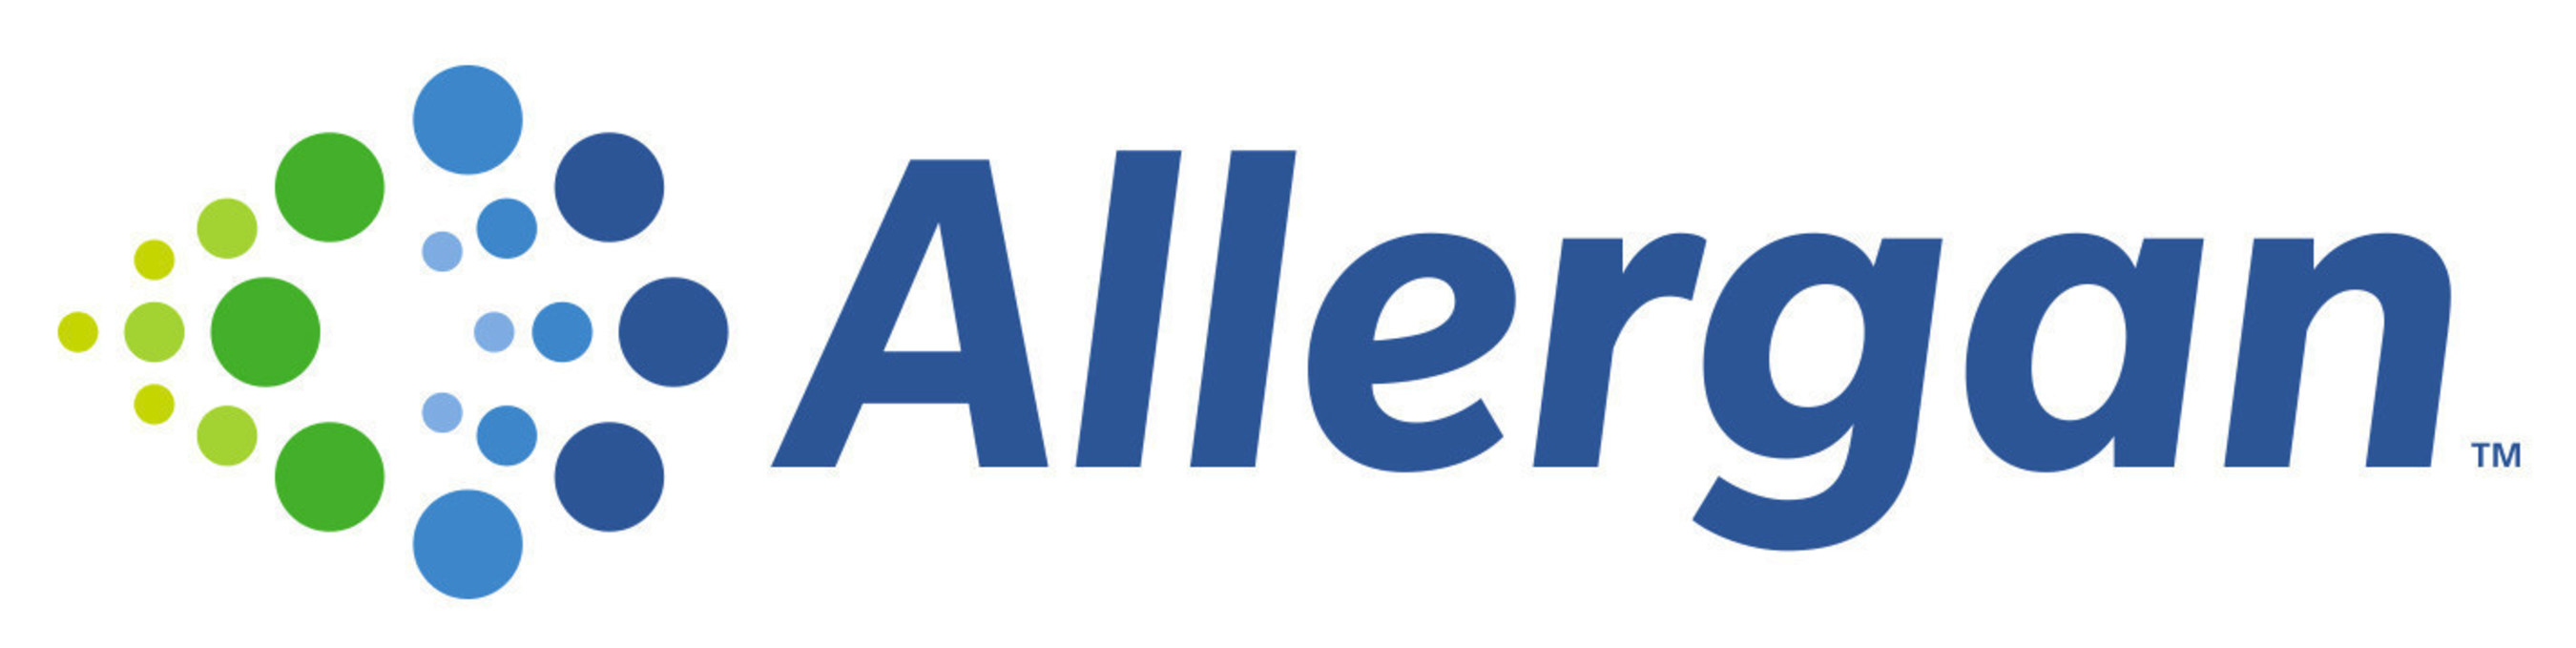 Allergan plc logo